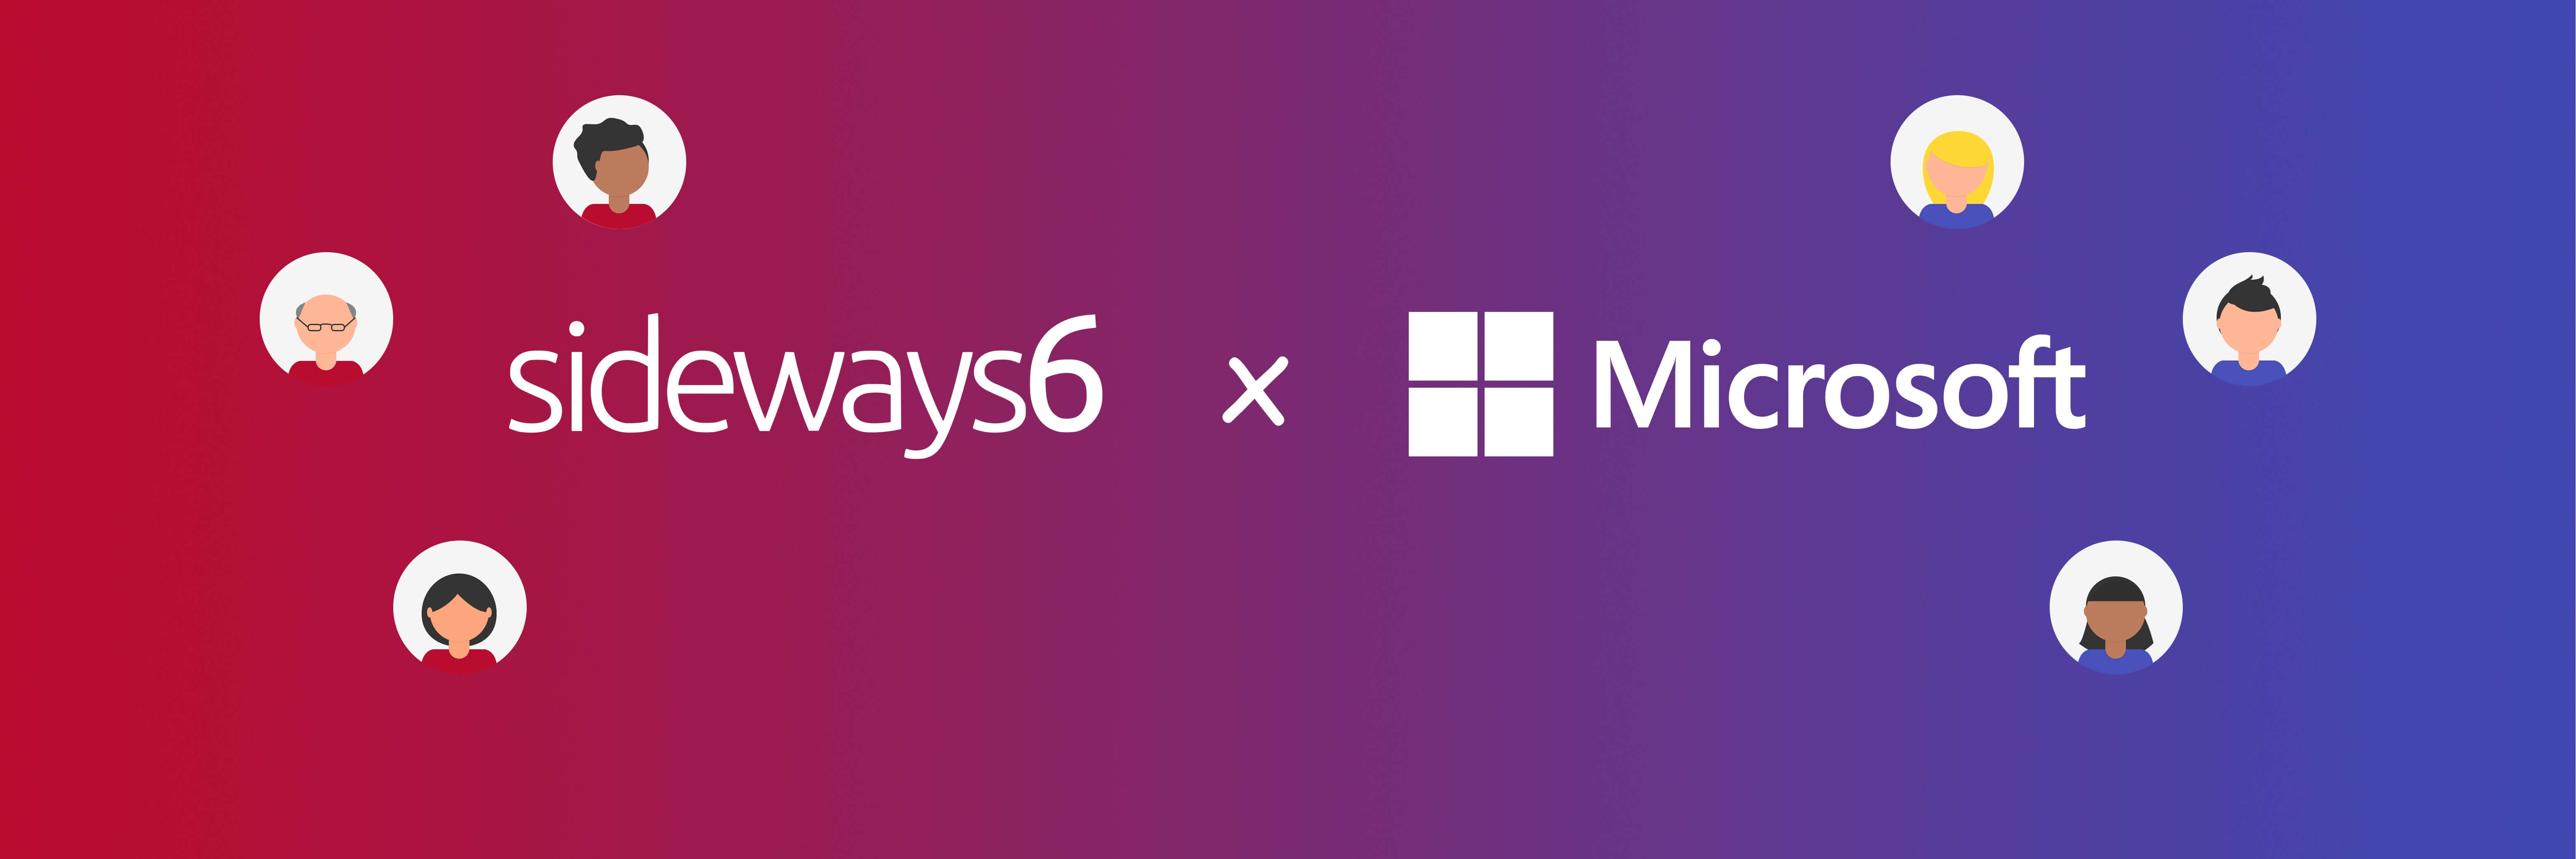 Sideways 6 and Microsoft - Teams App Development-2